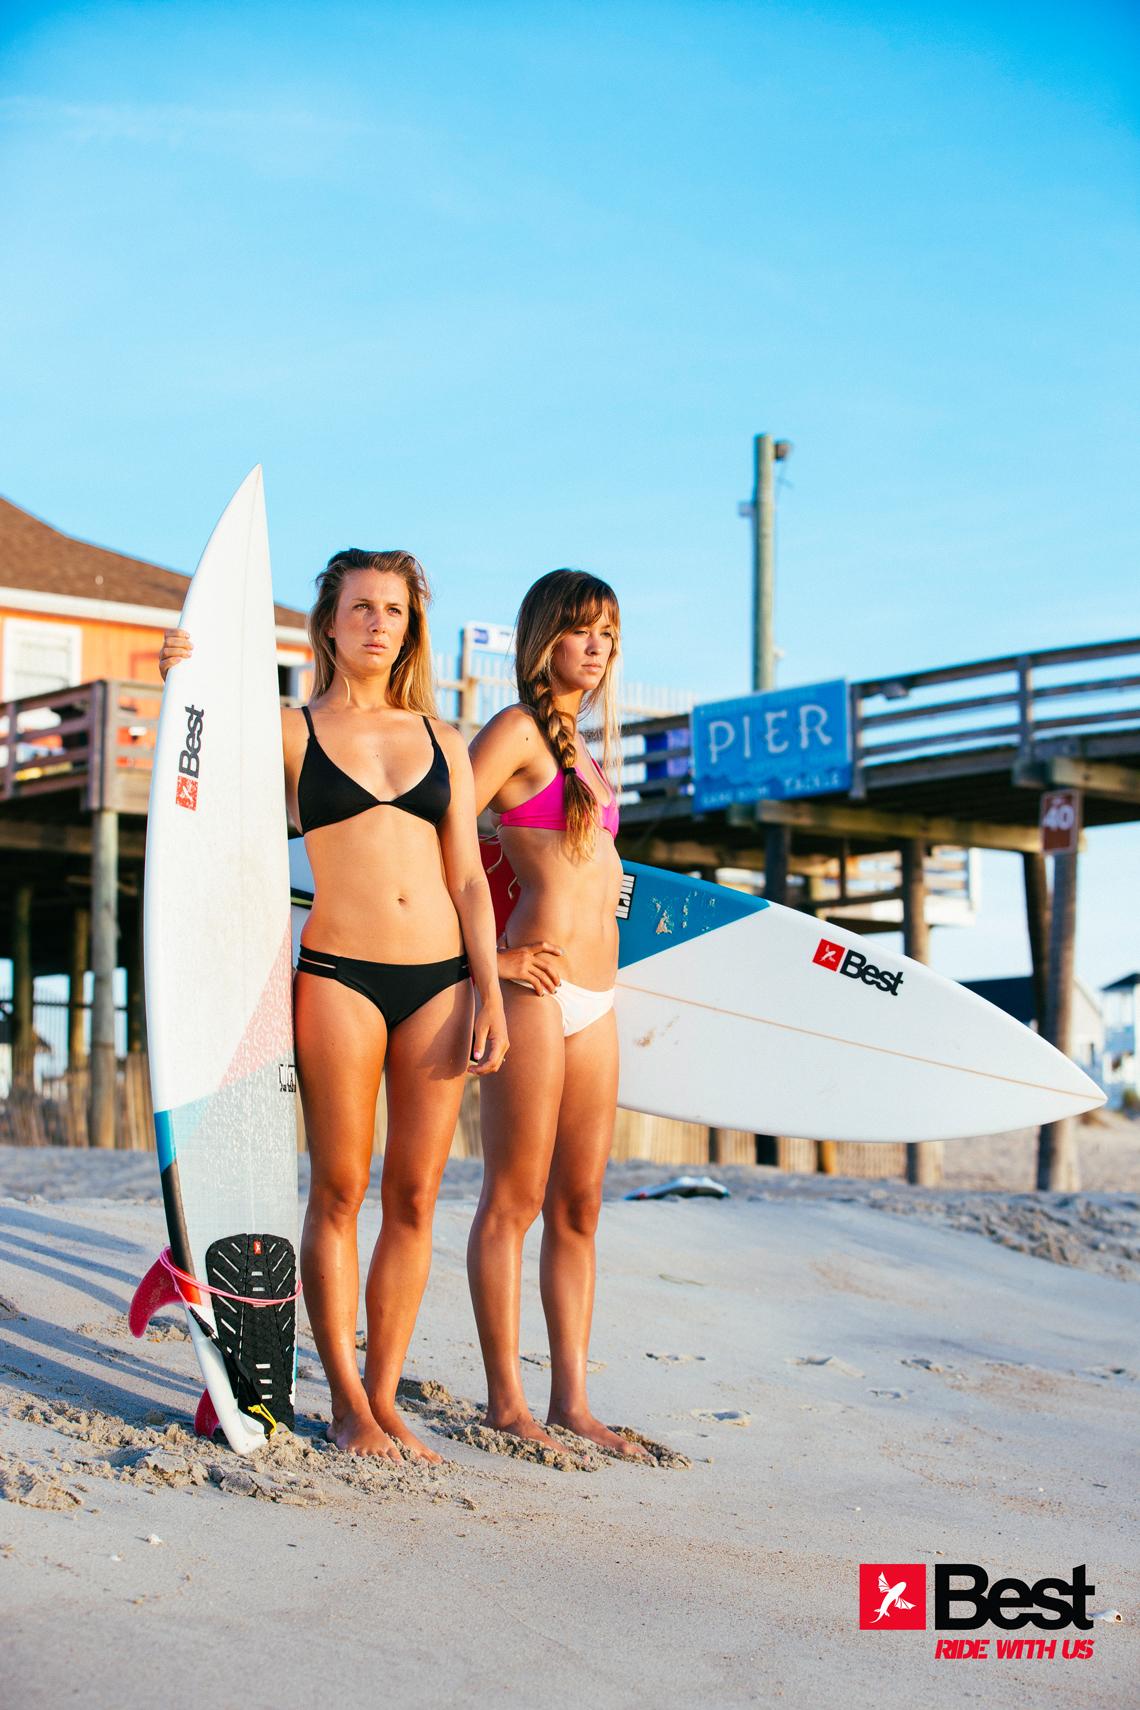 Two Best Kiteboarding kitechicks in bikini with surfboards looking to take a ride